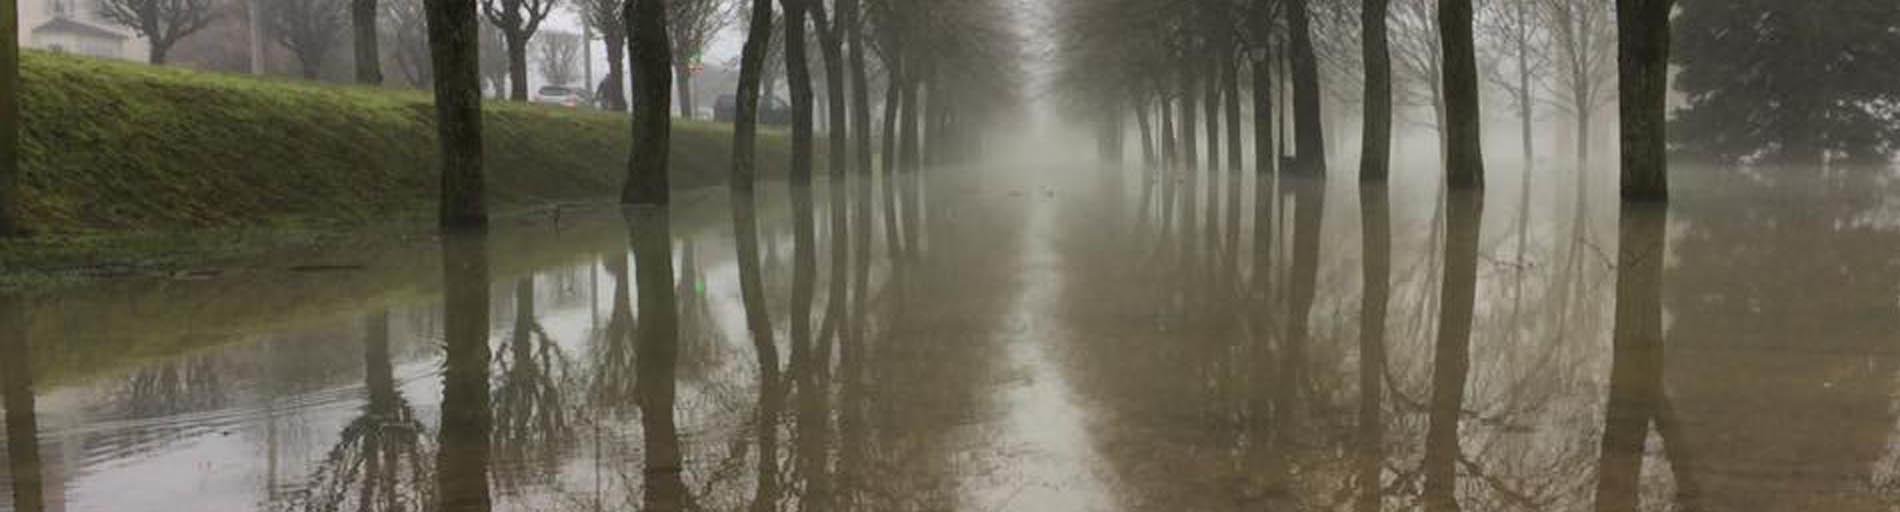 #VigicruesMontereau: état de catastrophe naturelle